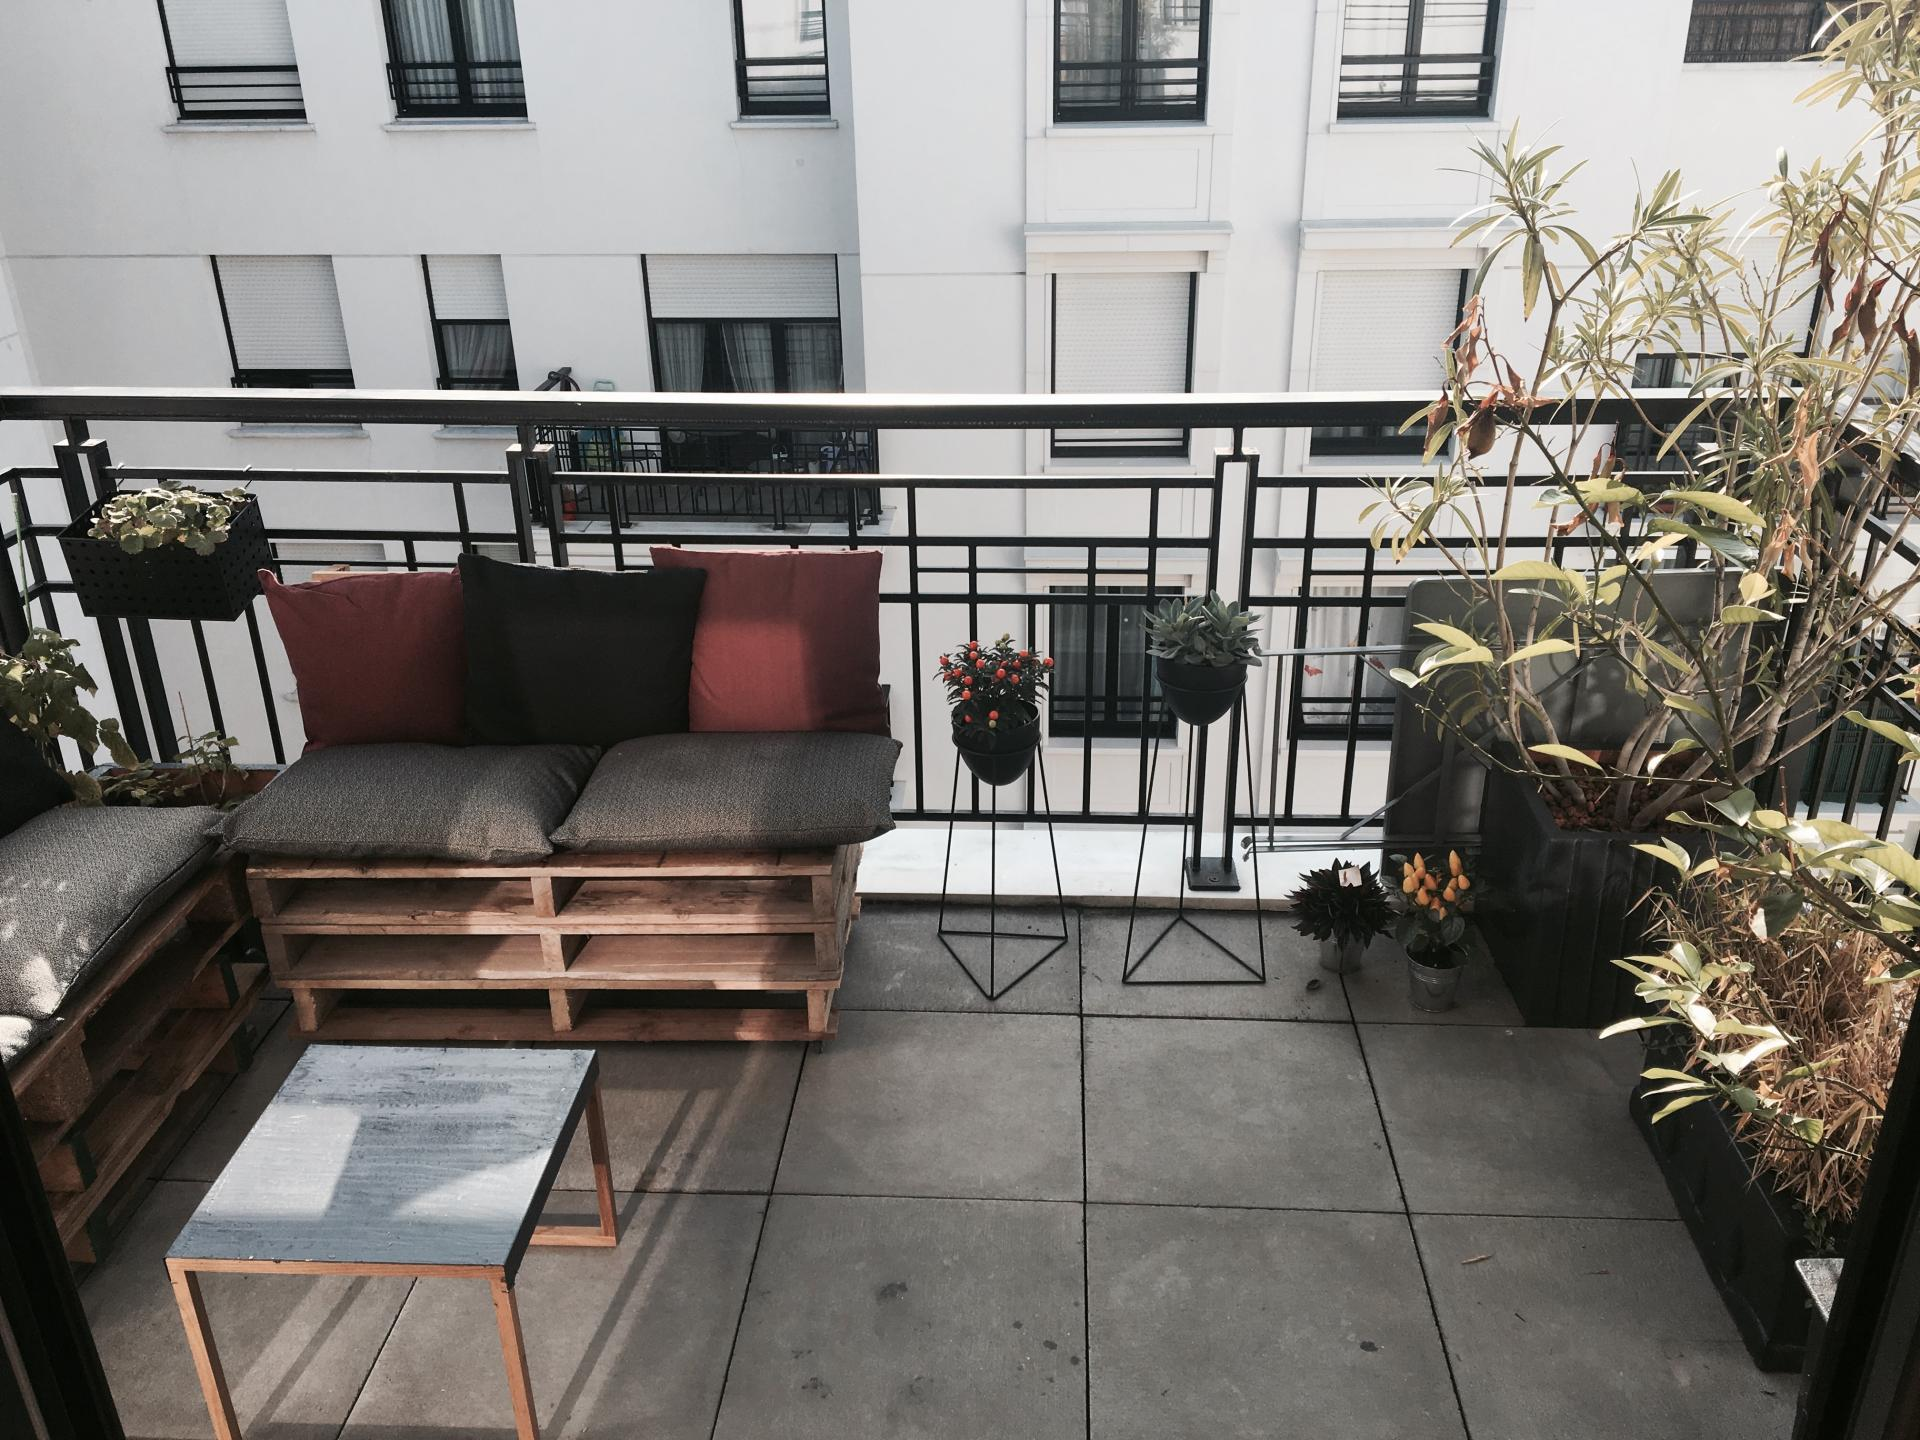 id es d co pour am nager une terrasse sharefashion. Black Bedroom Furniture Sets. Home Design Ideas